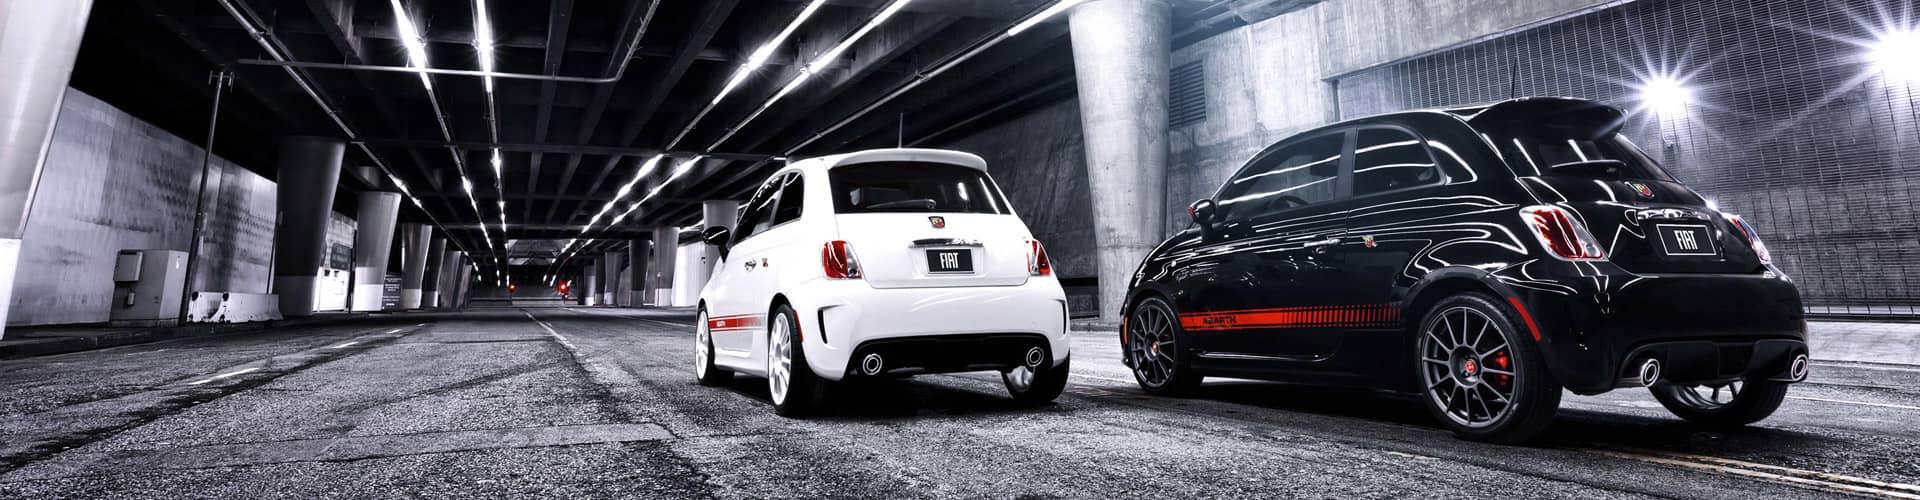 OEM Mopar & Fiat Parts and Accessories | MoparPartInternational